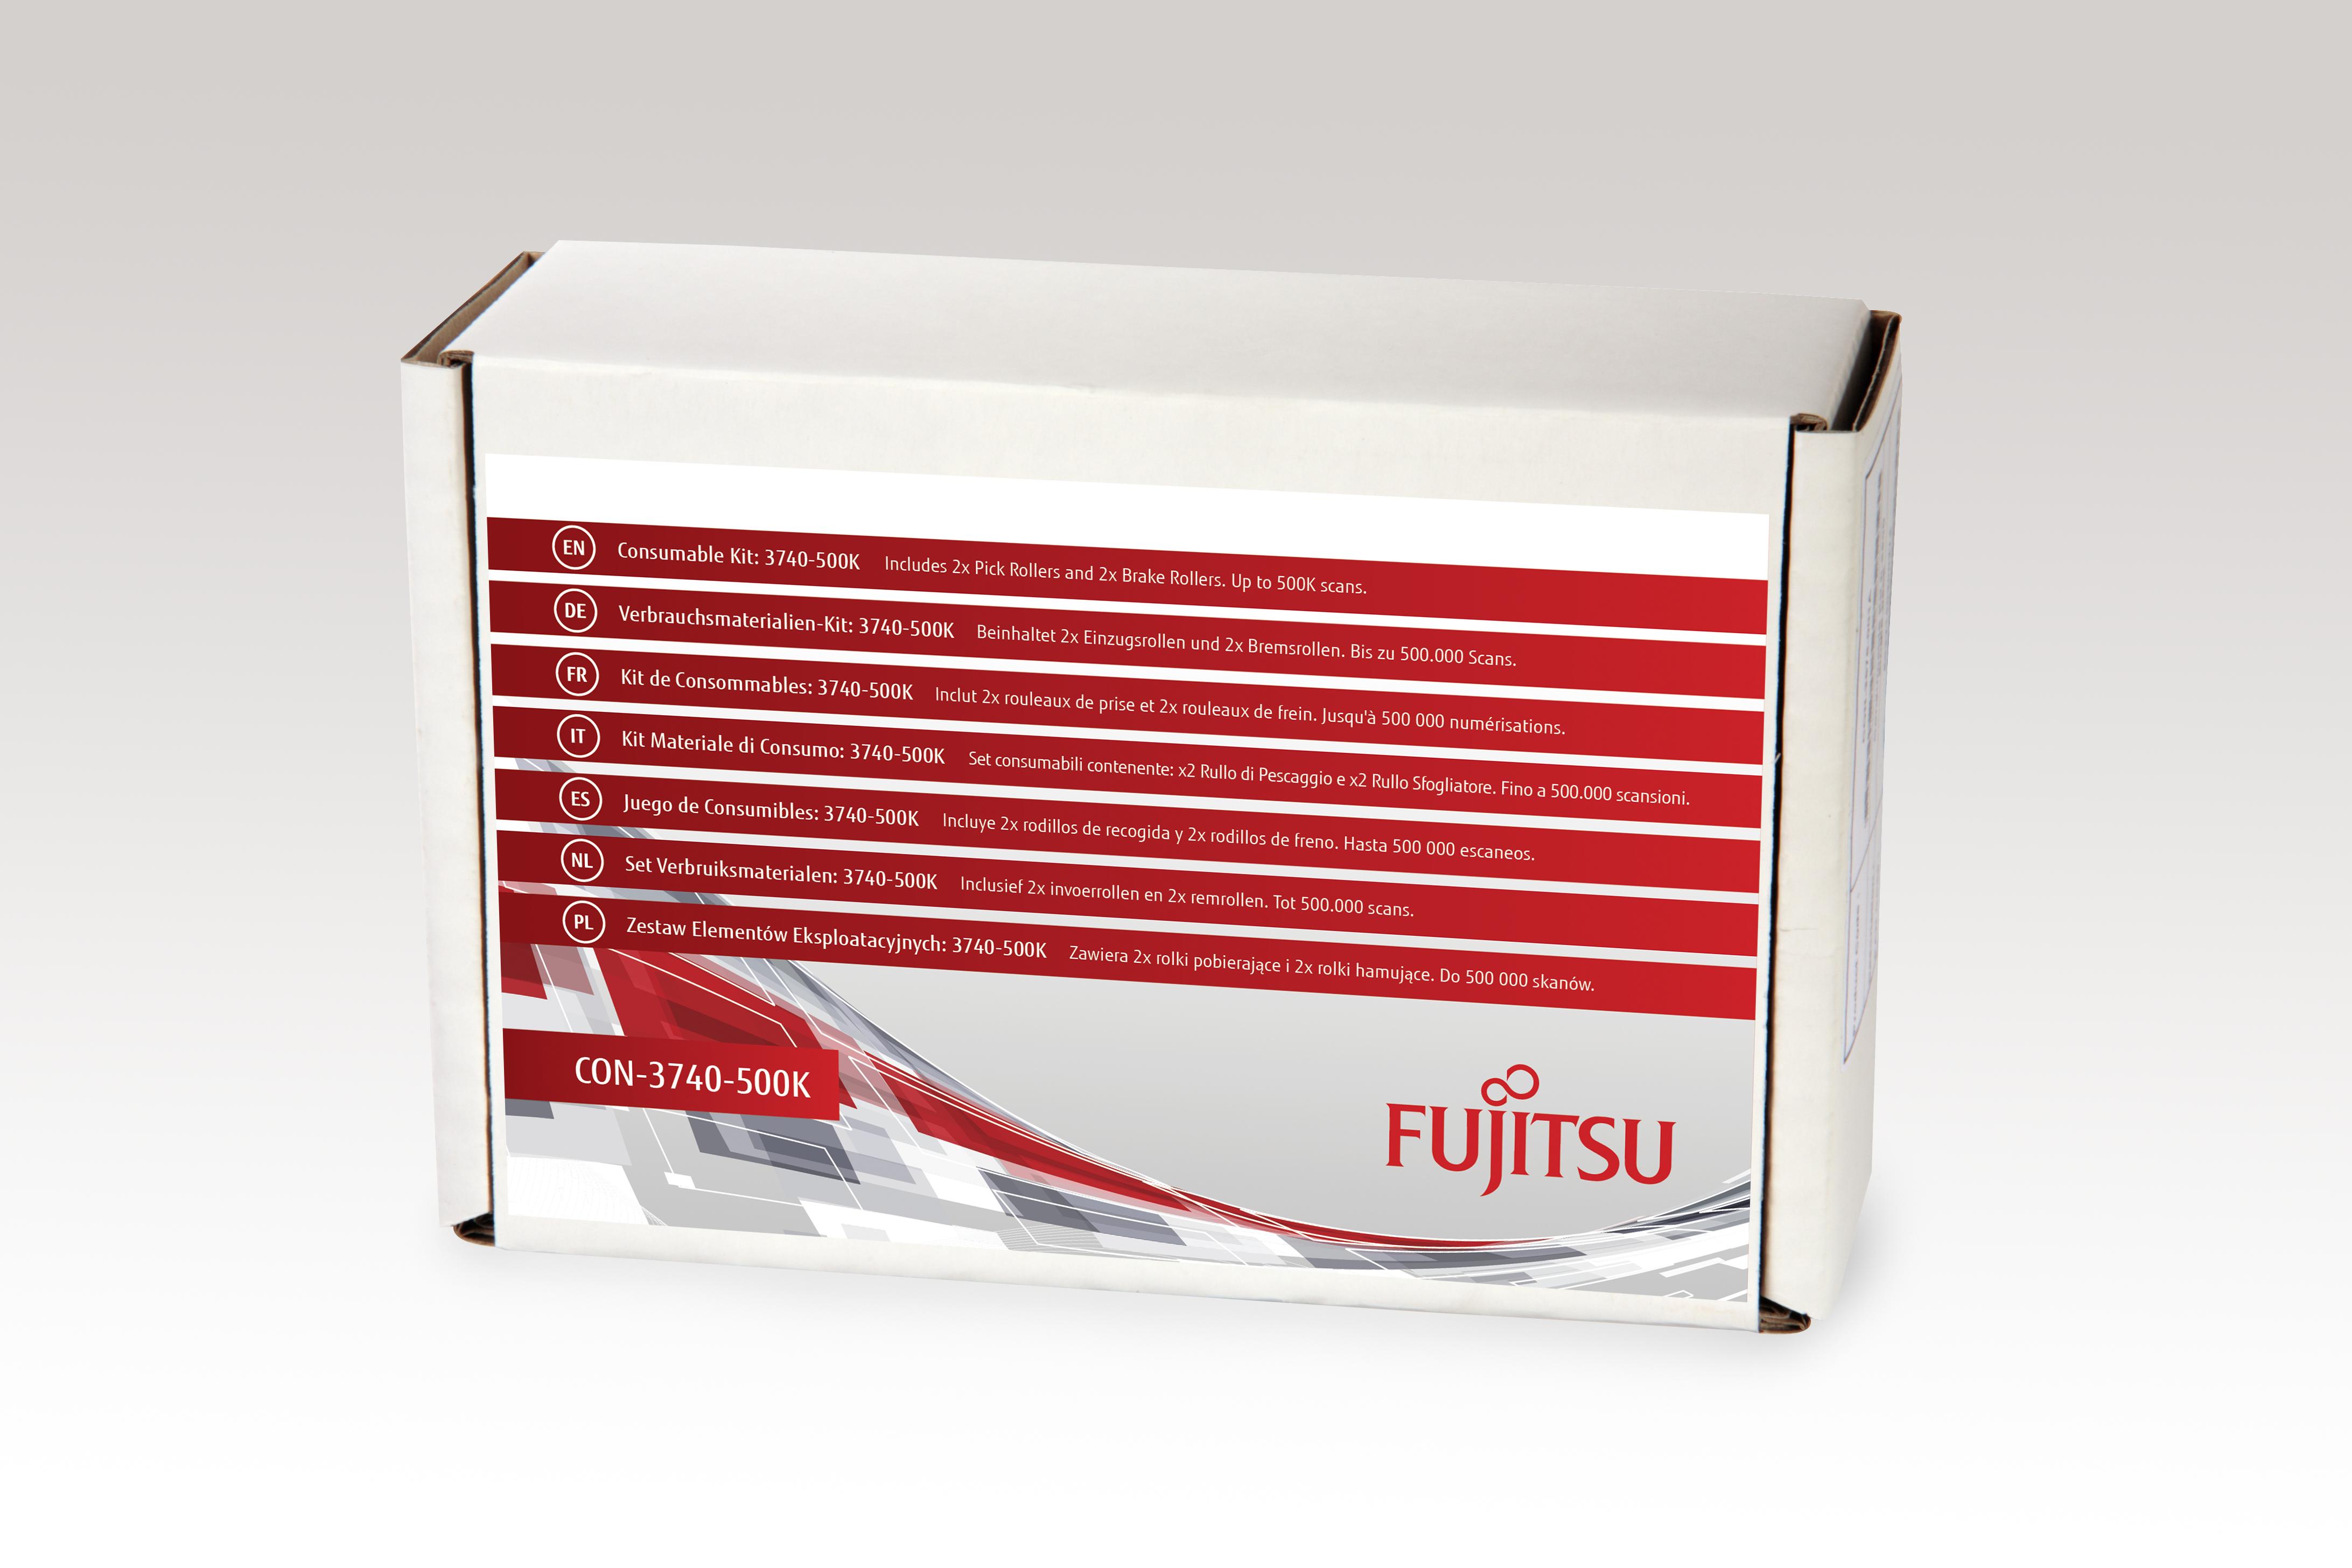 Fujitsu Consumable Kit: 3740-500K - Scanner - Verbrauchsmaterialienkit